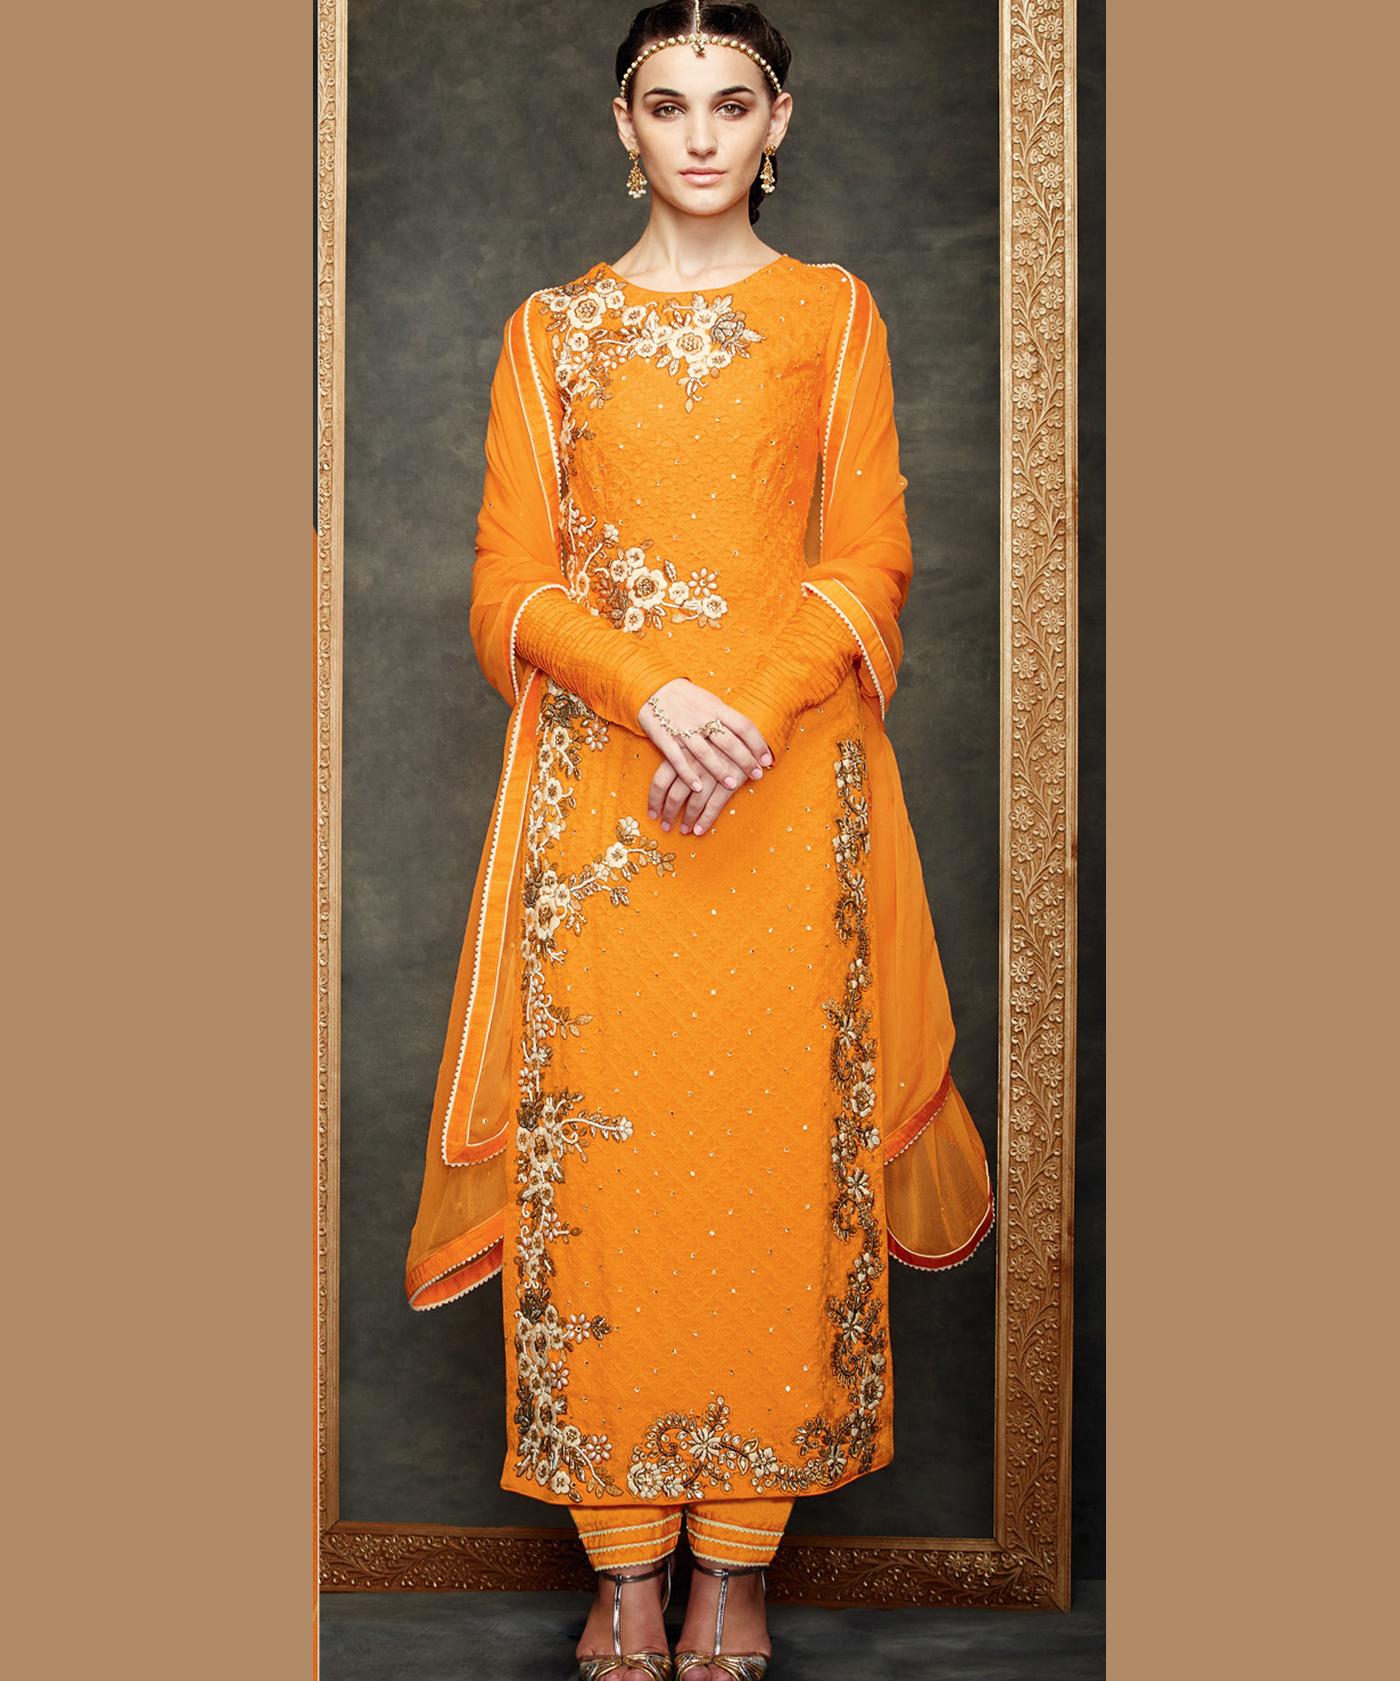 d8e20f611f28 ... Meera Bright Orange Embroidered Semi Stitched Dress - Online Shopping  India ...